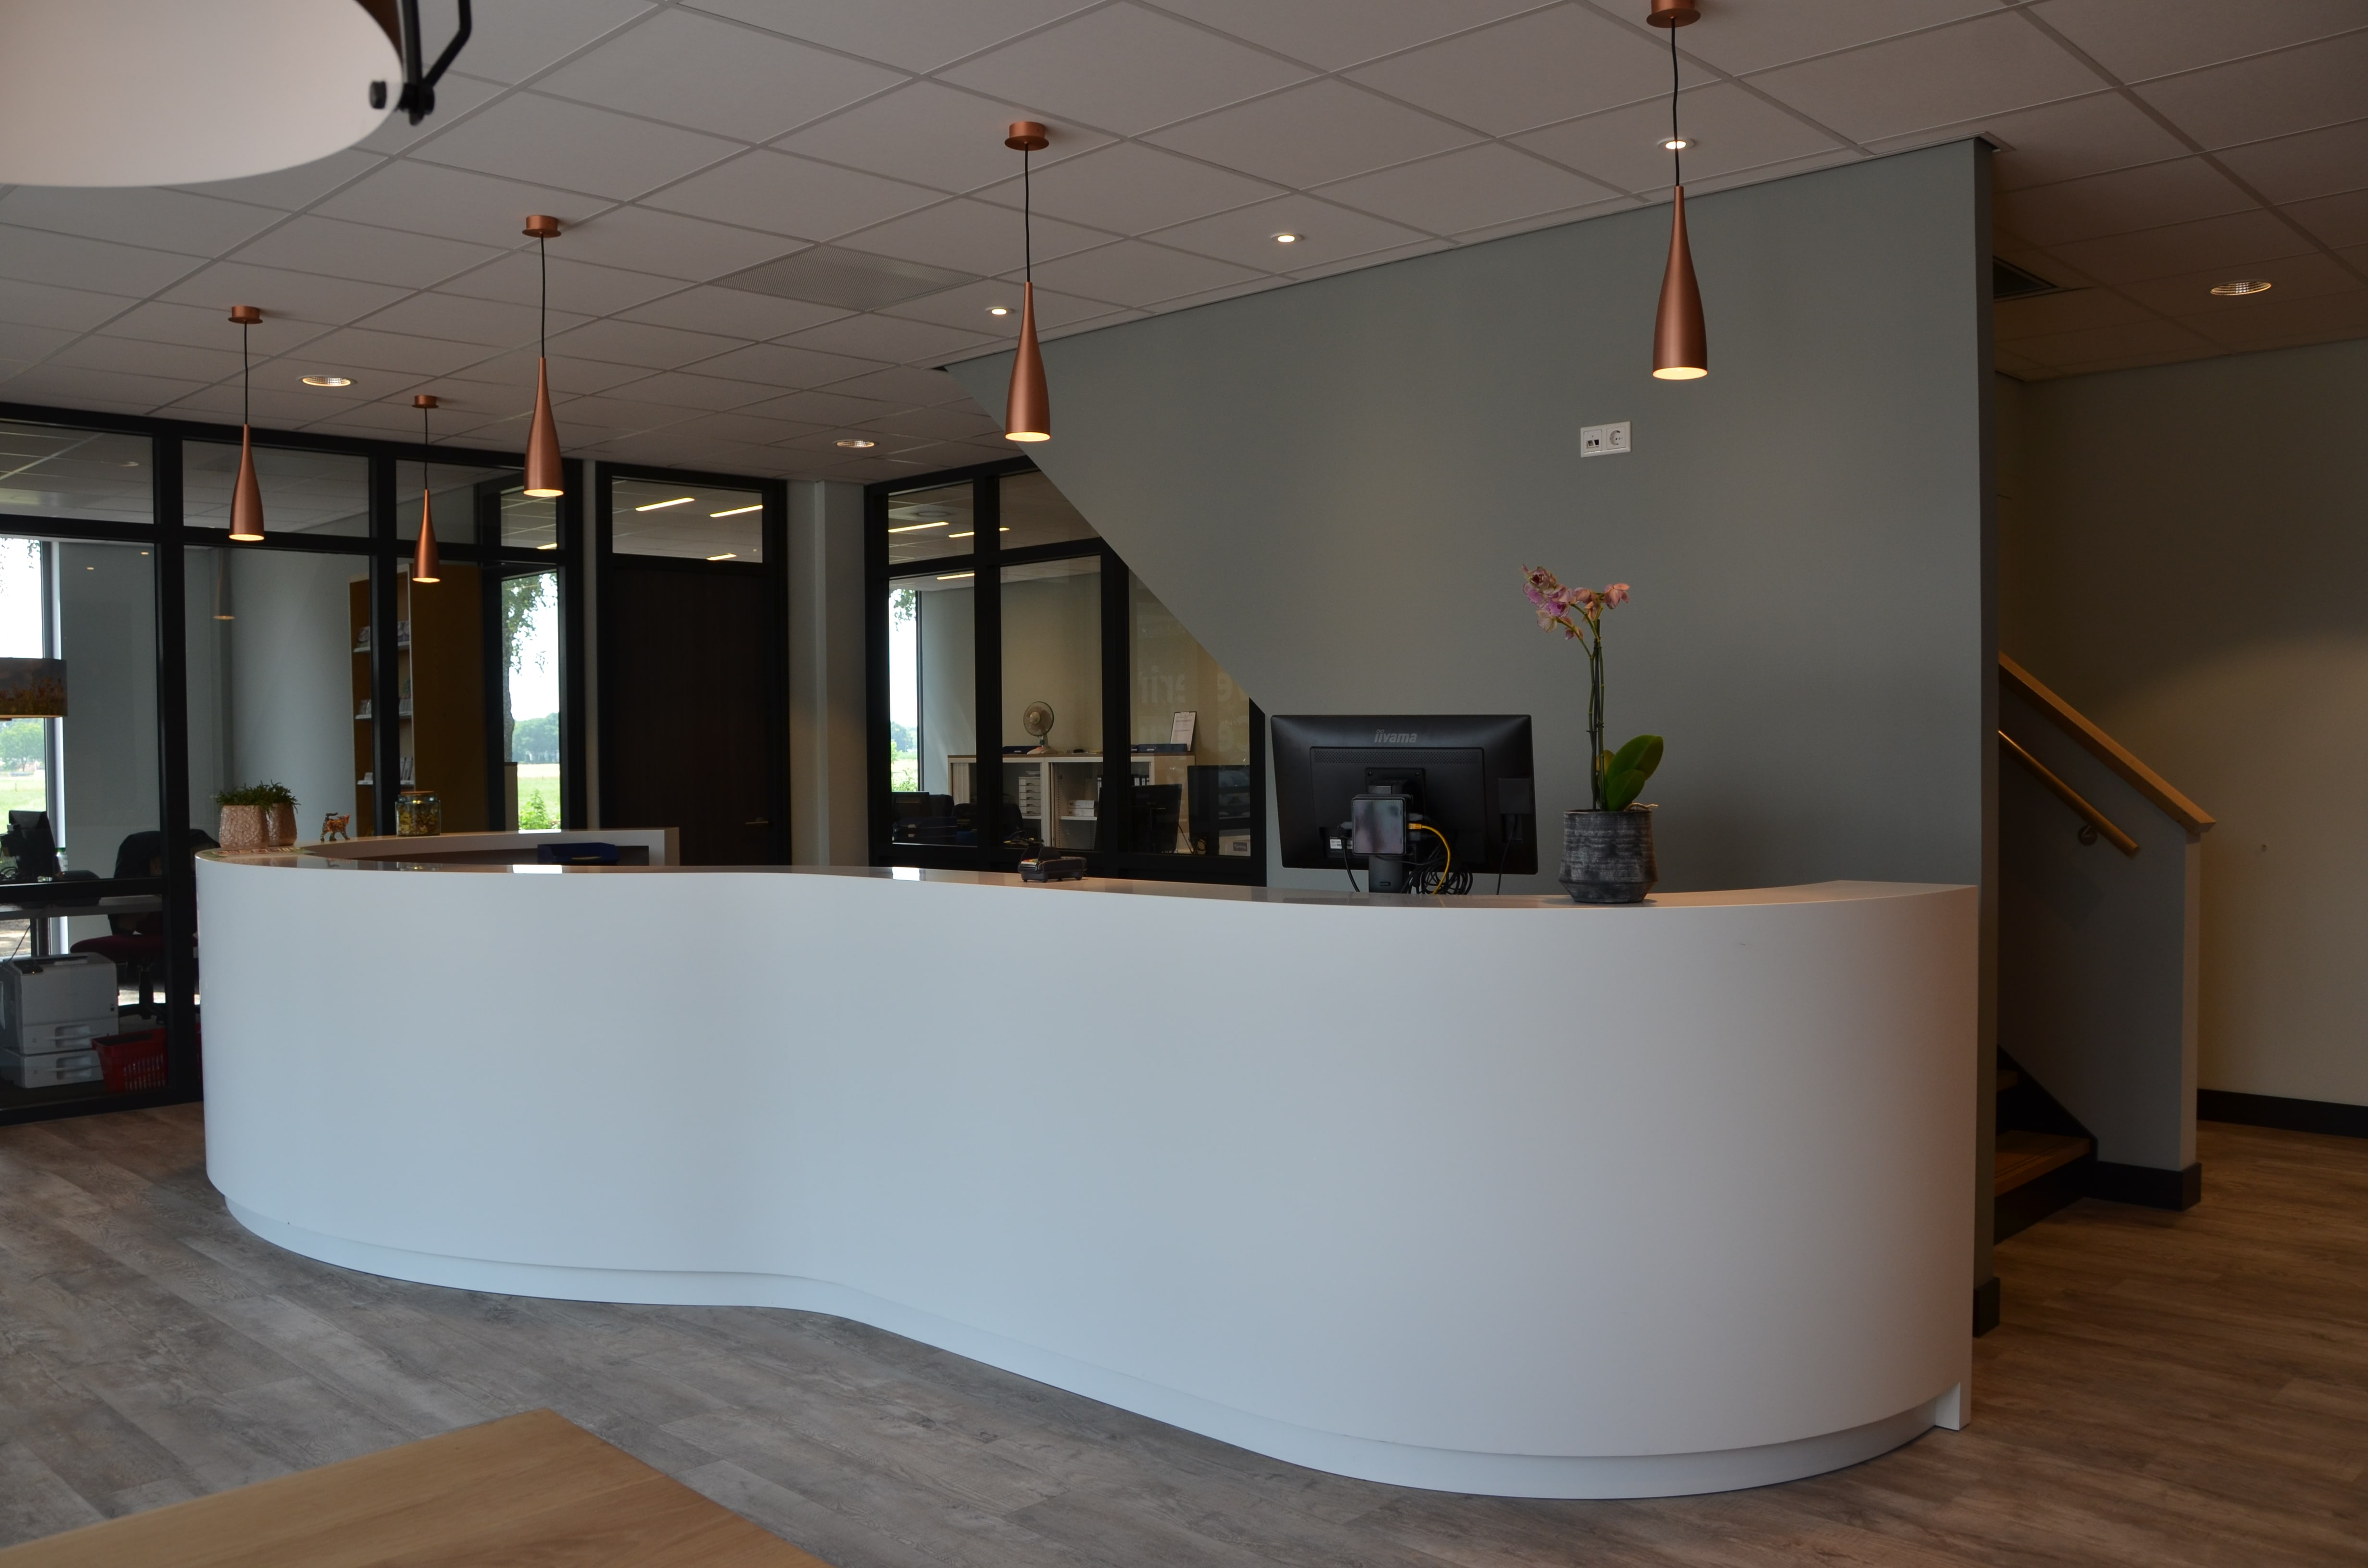 interieur veterinair centrum kenmerken van dit project modern